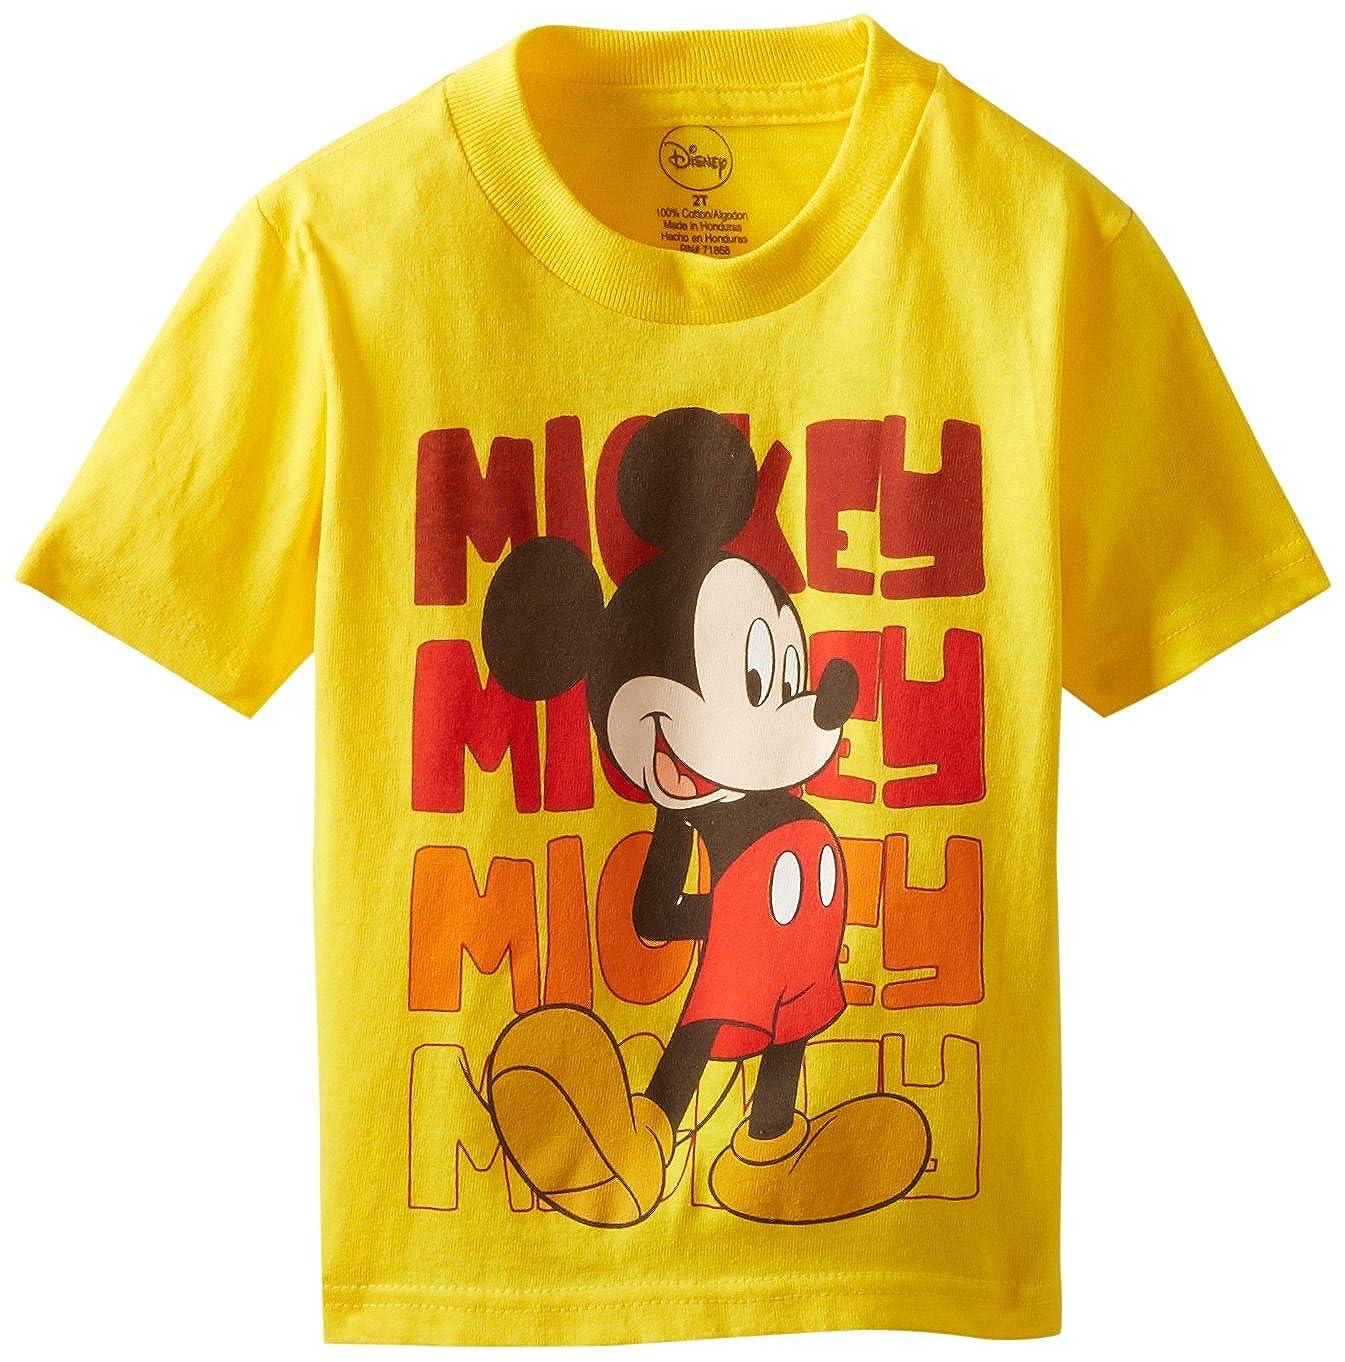 8dab9fd40b Amazon.com: Disney Mickey Mouse Boys' T-Shirt: Clothing